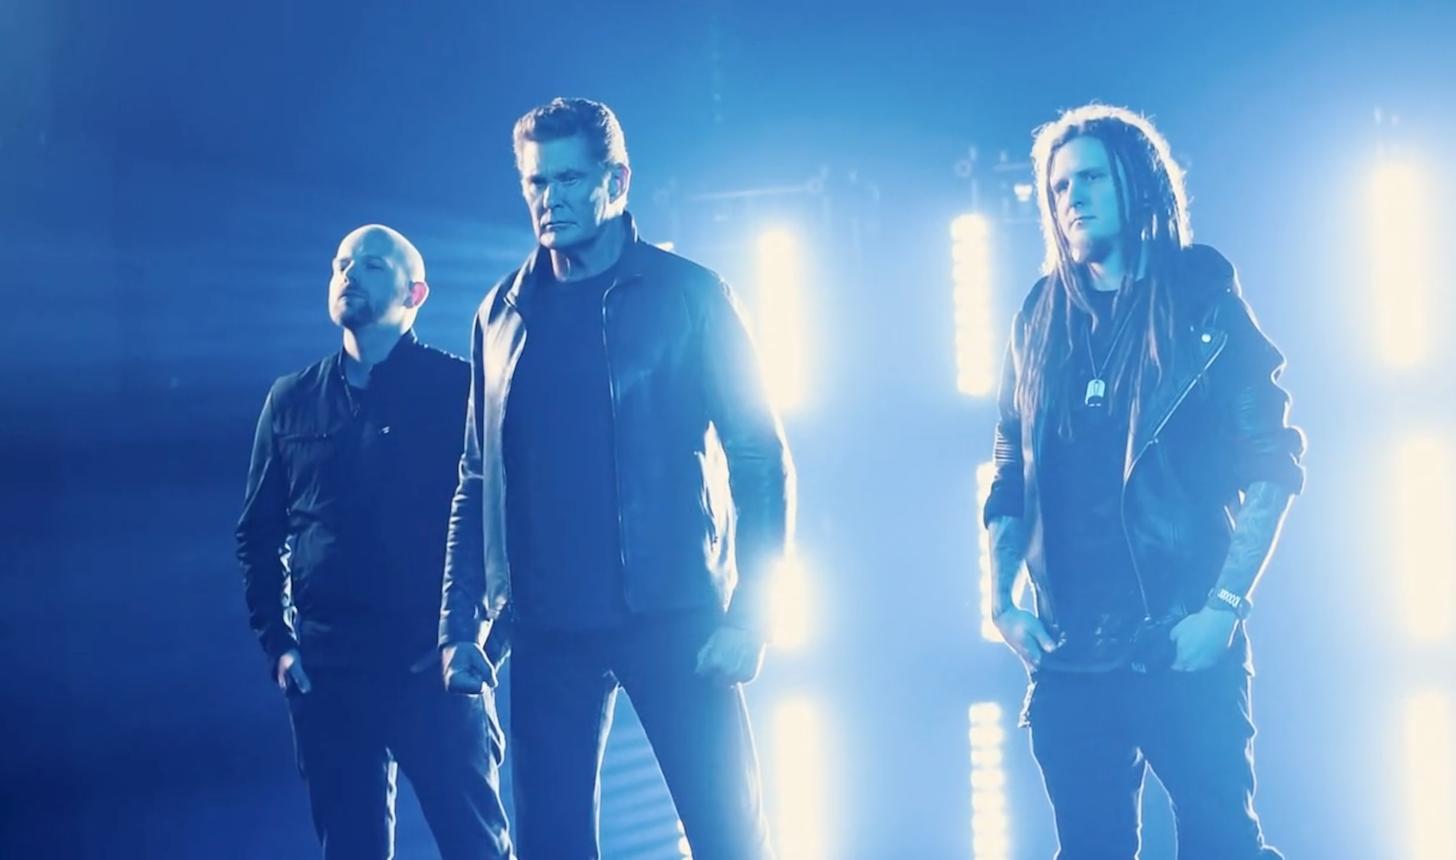 BIZÁR TÝDNE: Podpořte metalový singl Davida Hasselhoffa